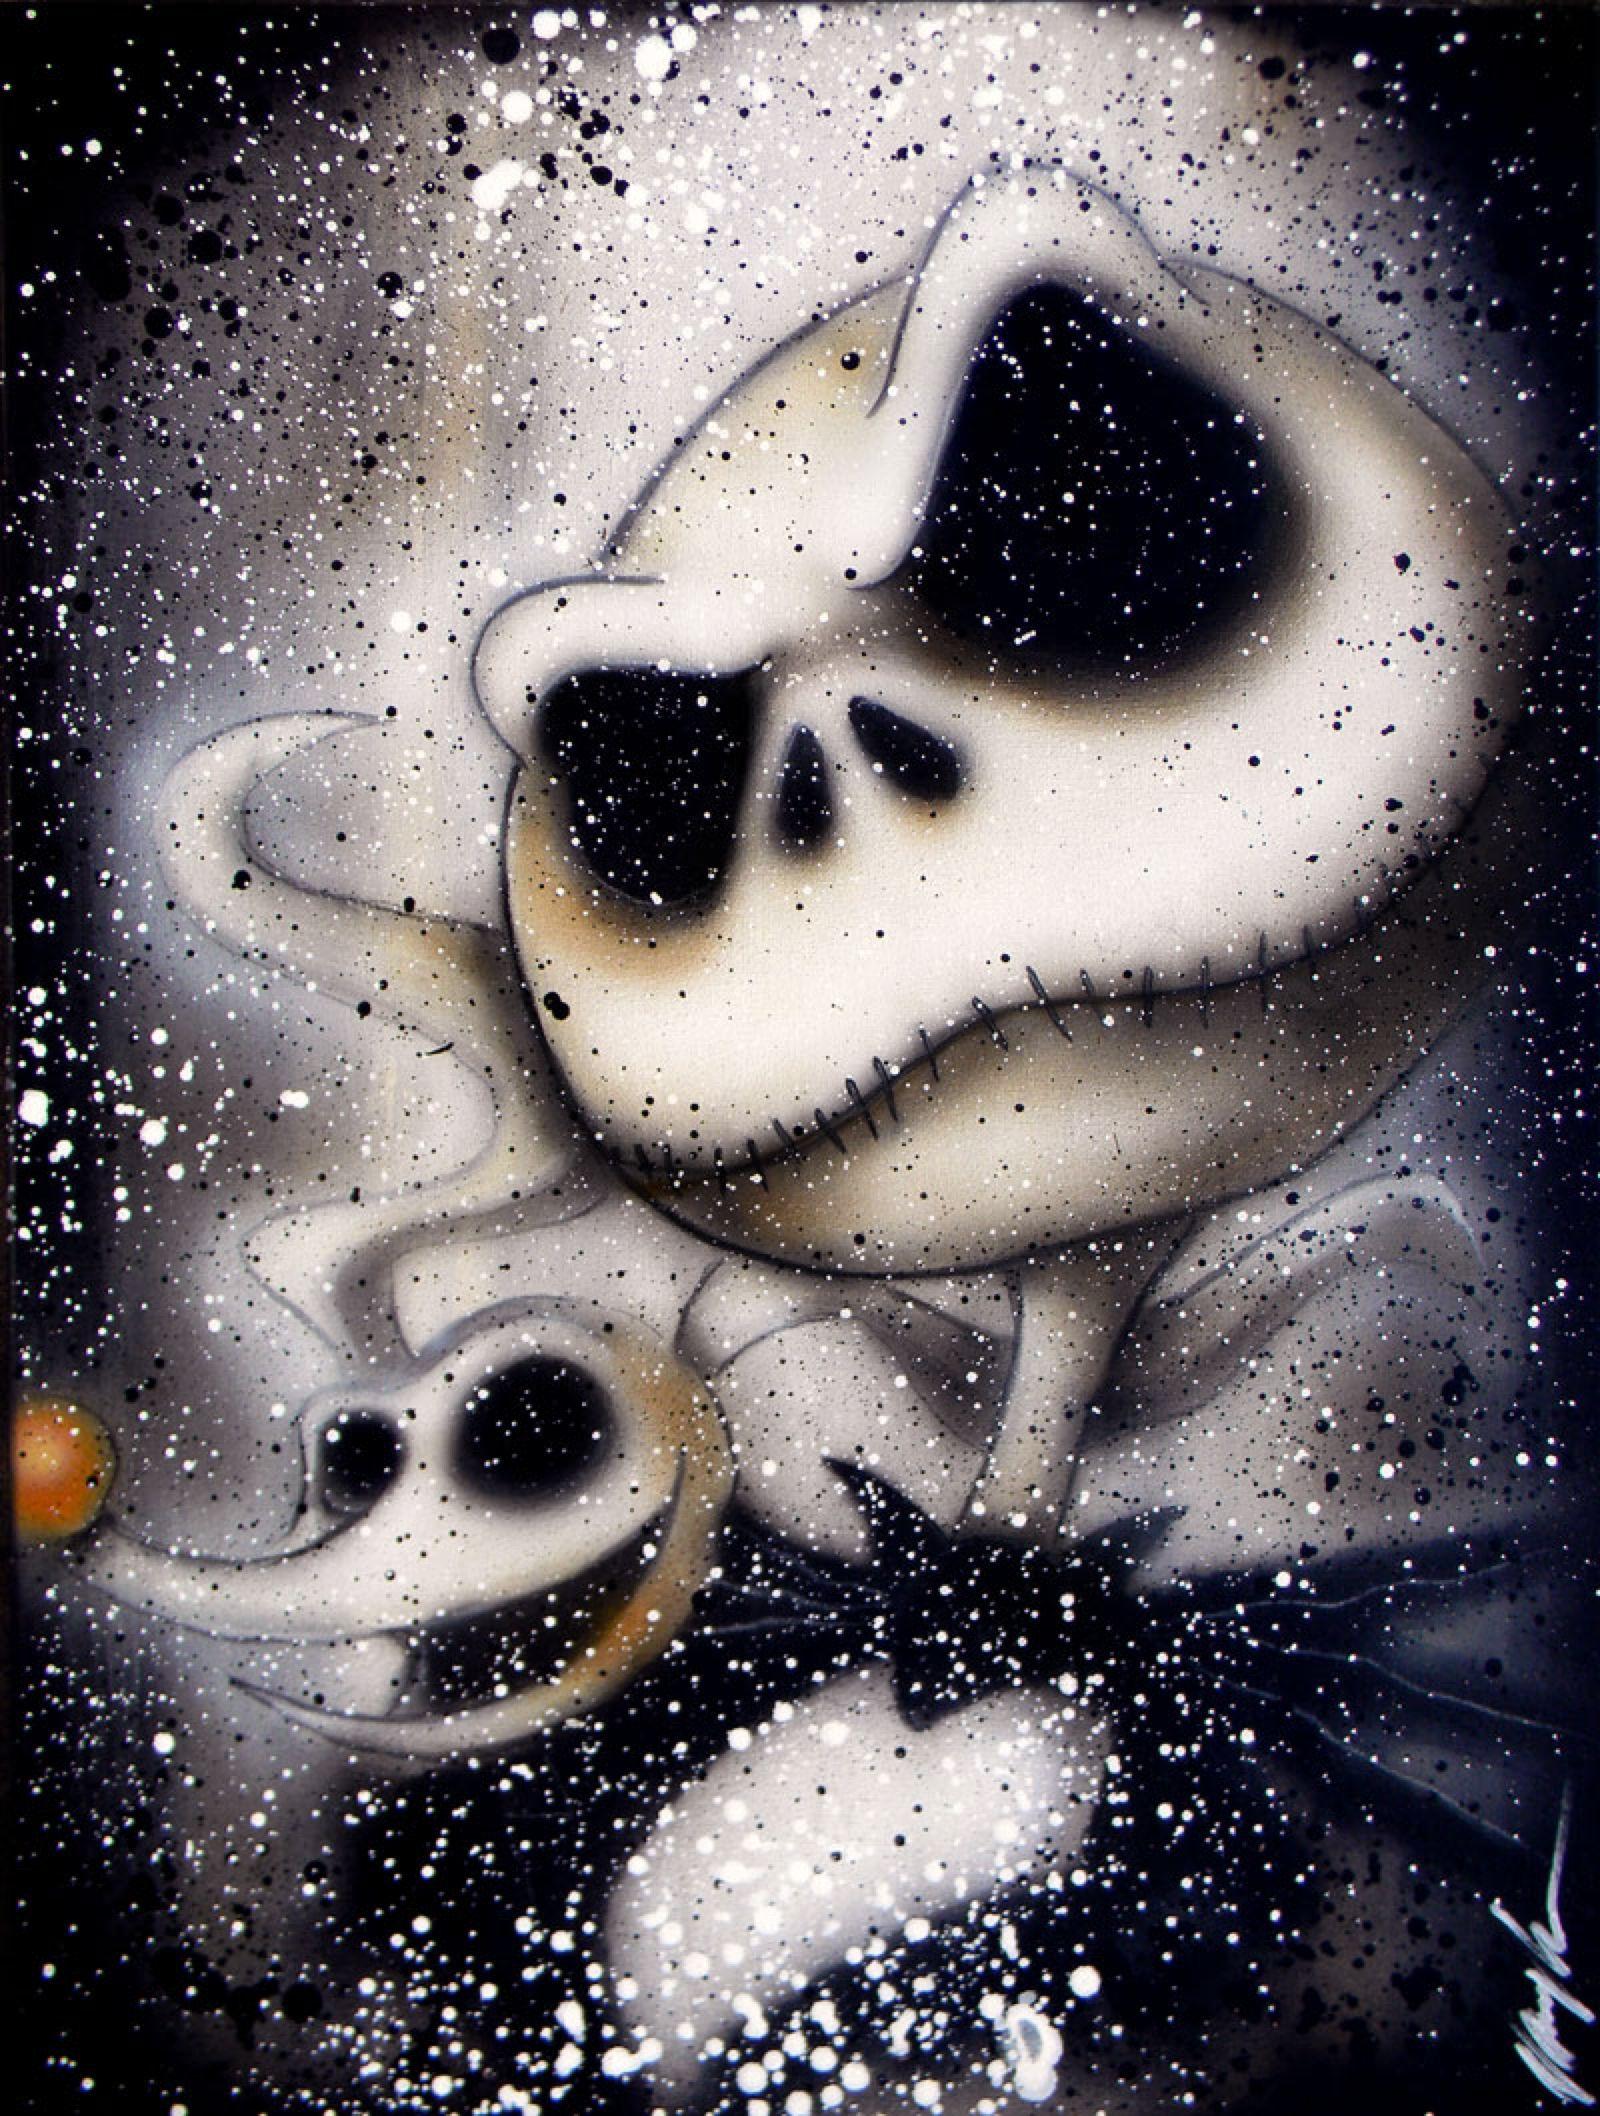 Jack And Zero By Vaughnb On Deviantart Nightmare Before Christmas Tattoo Nightmare Before Christmas Wallpaper Nightmare Before Christmas Drawings